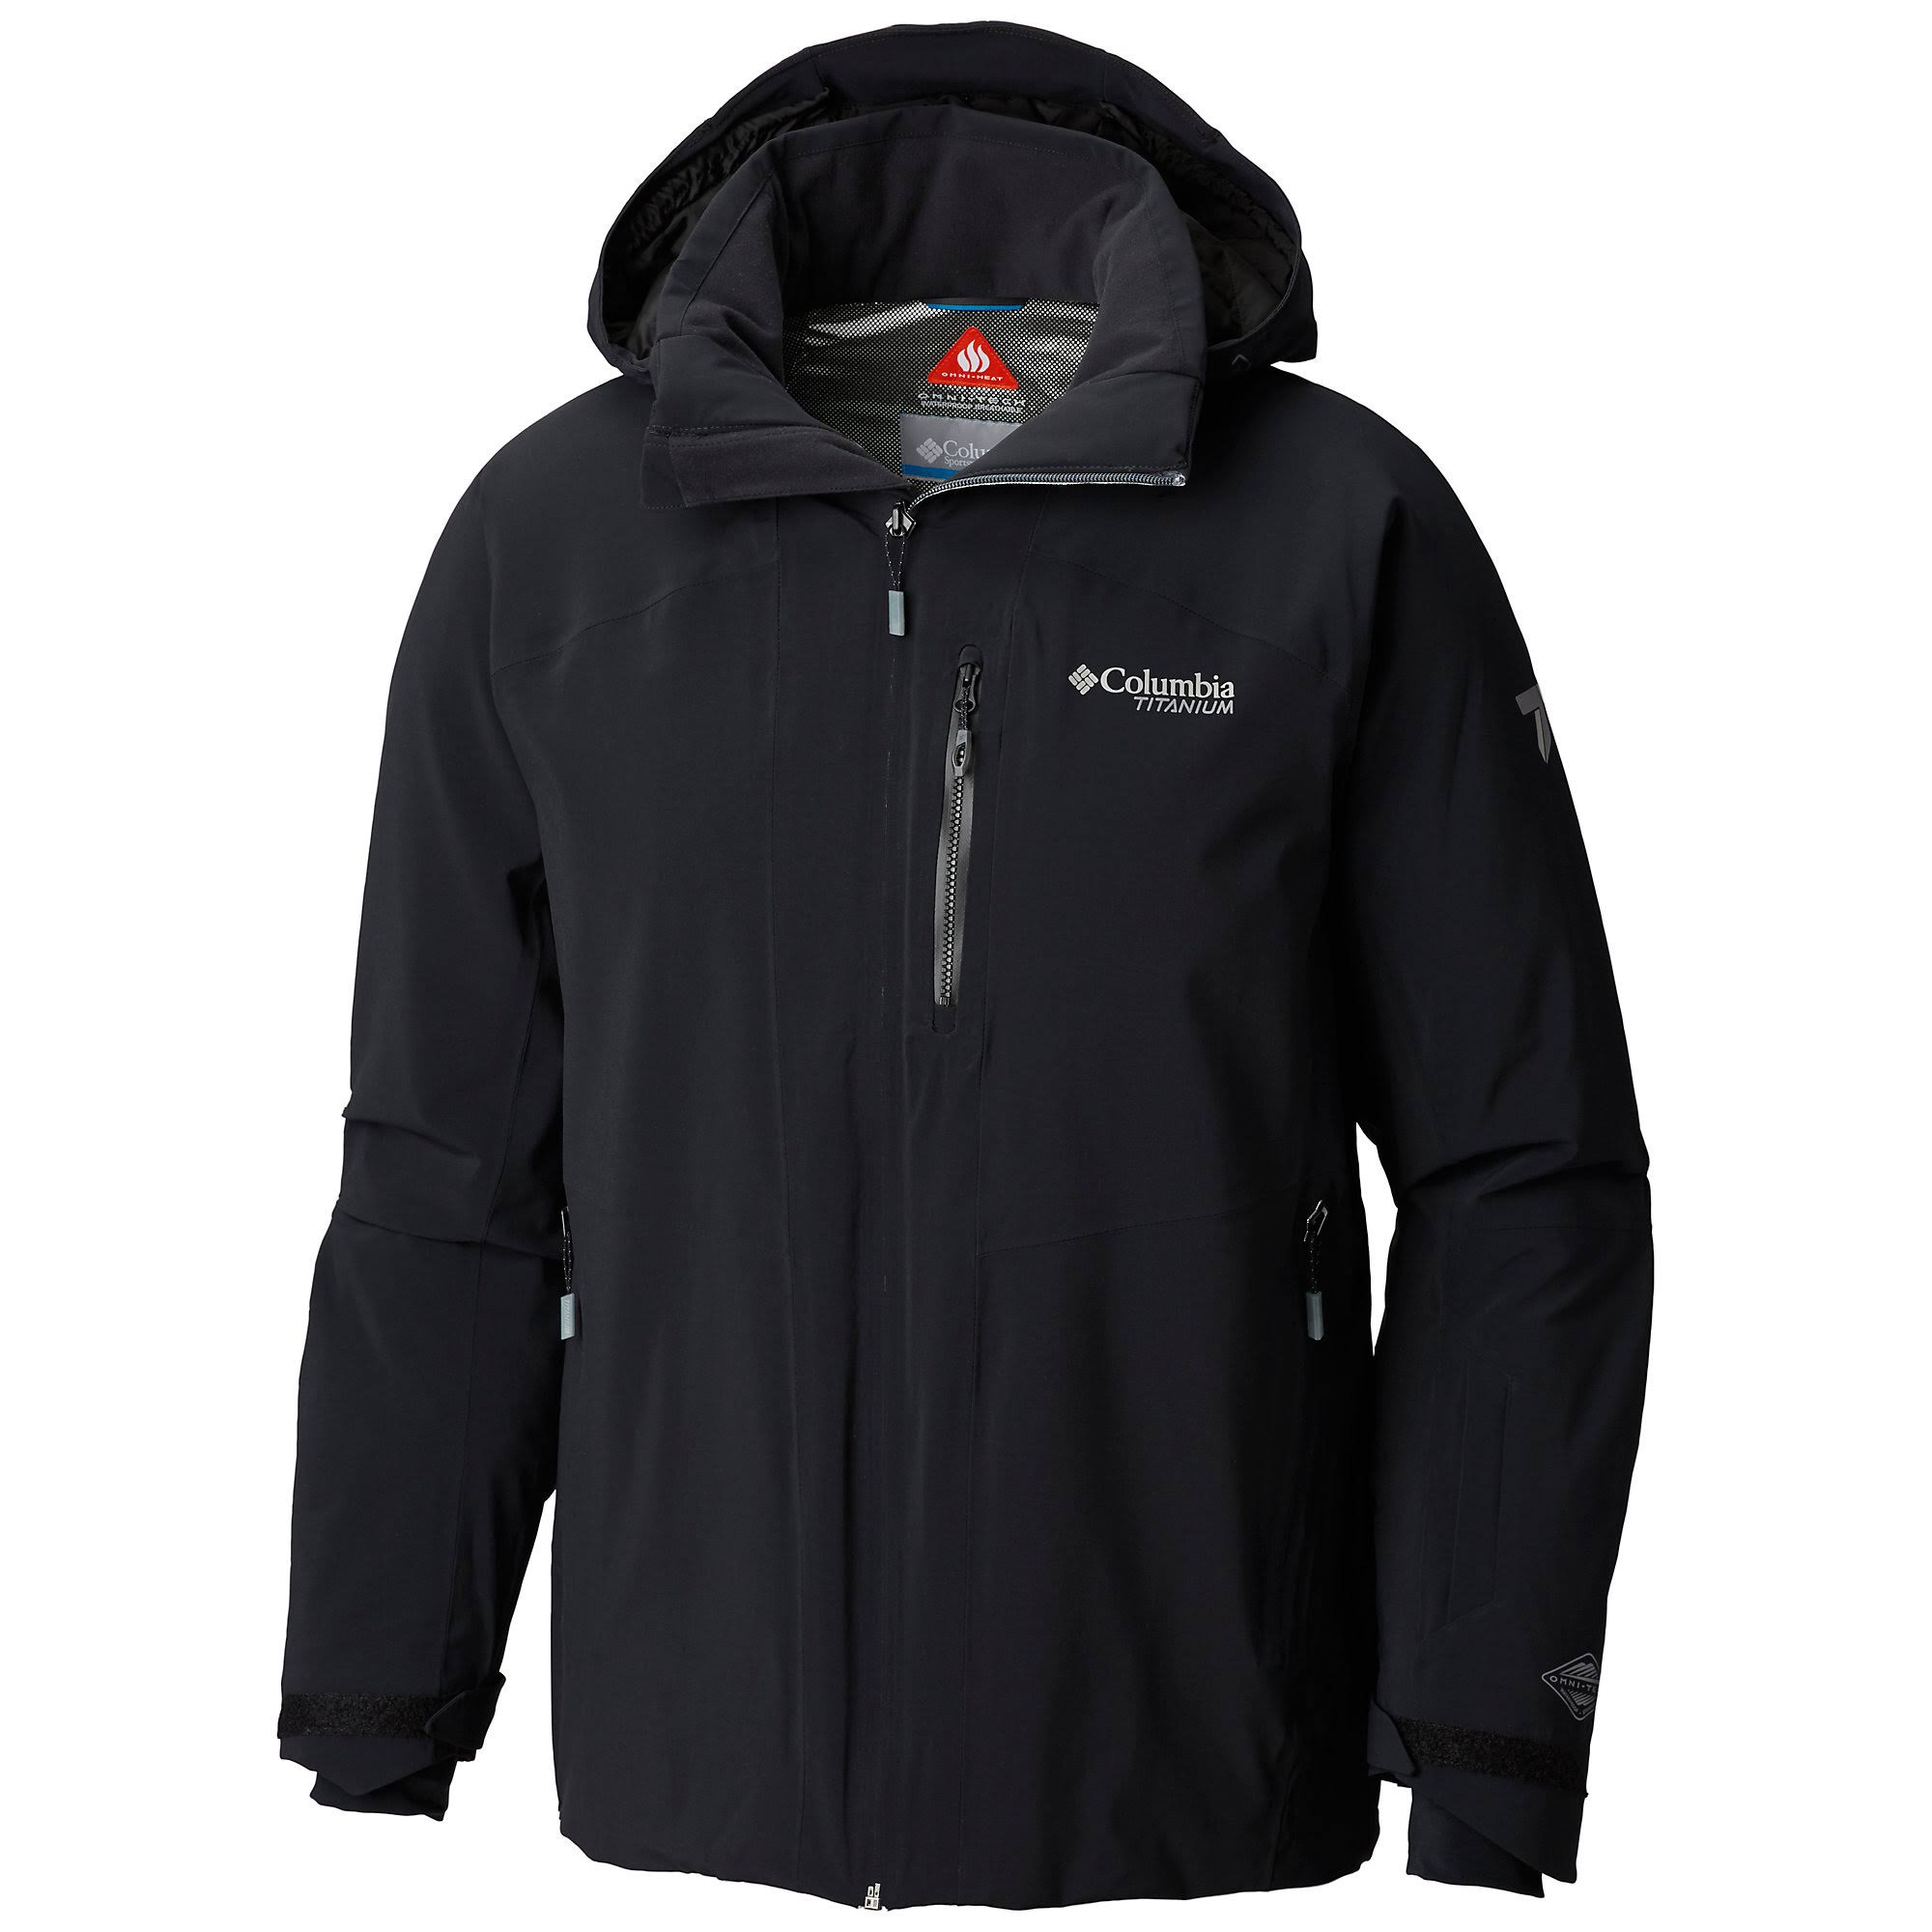 Herren Rival Snow 1798581010 s Columbia Small Jacket Schwarz w7tzqqH1